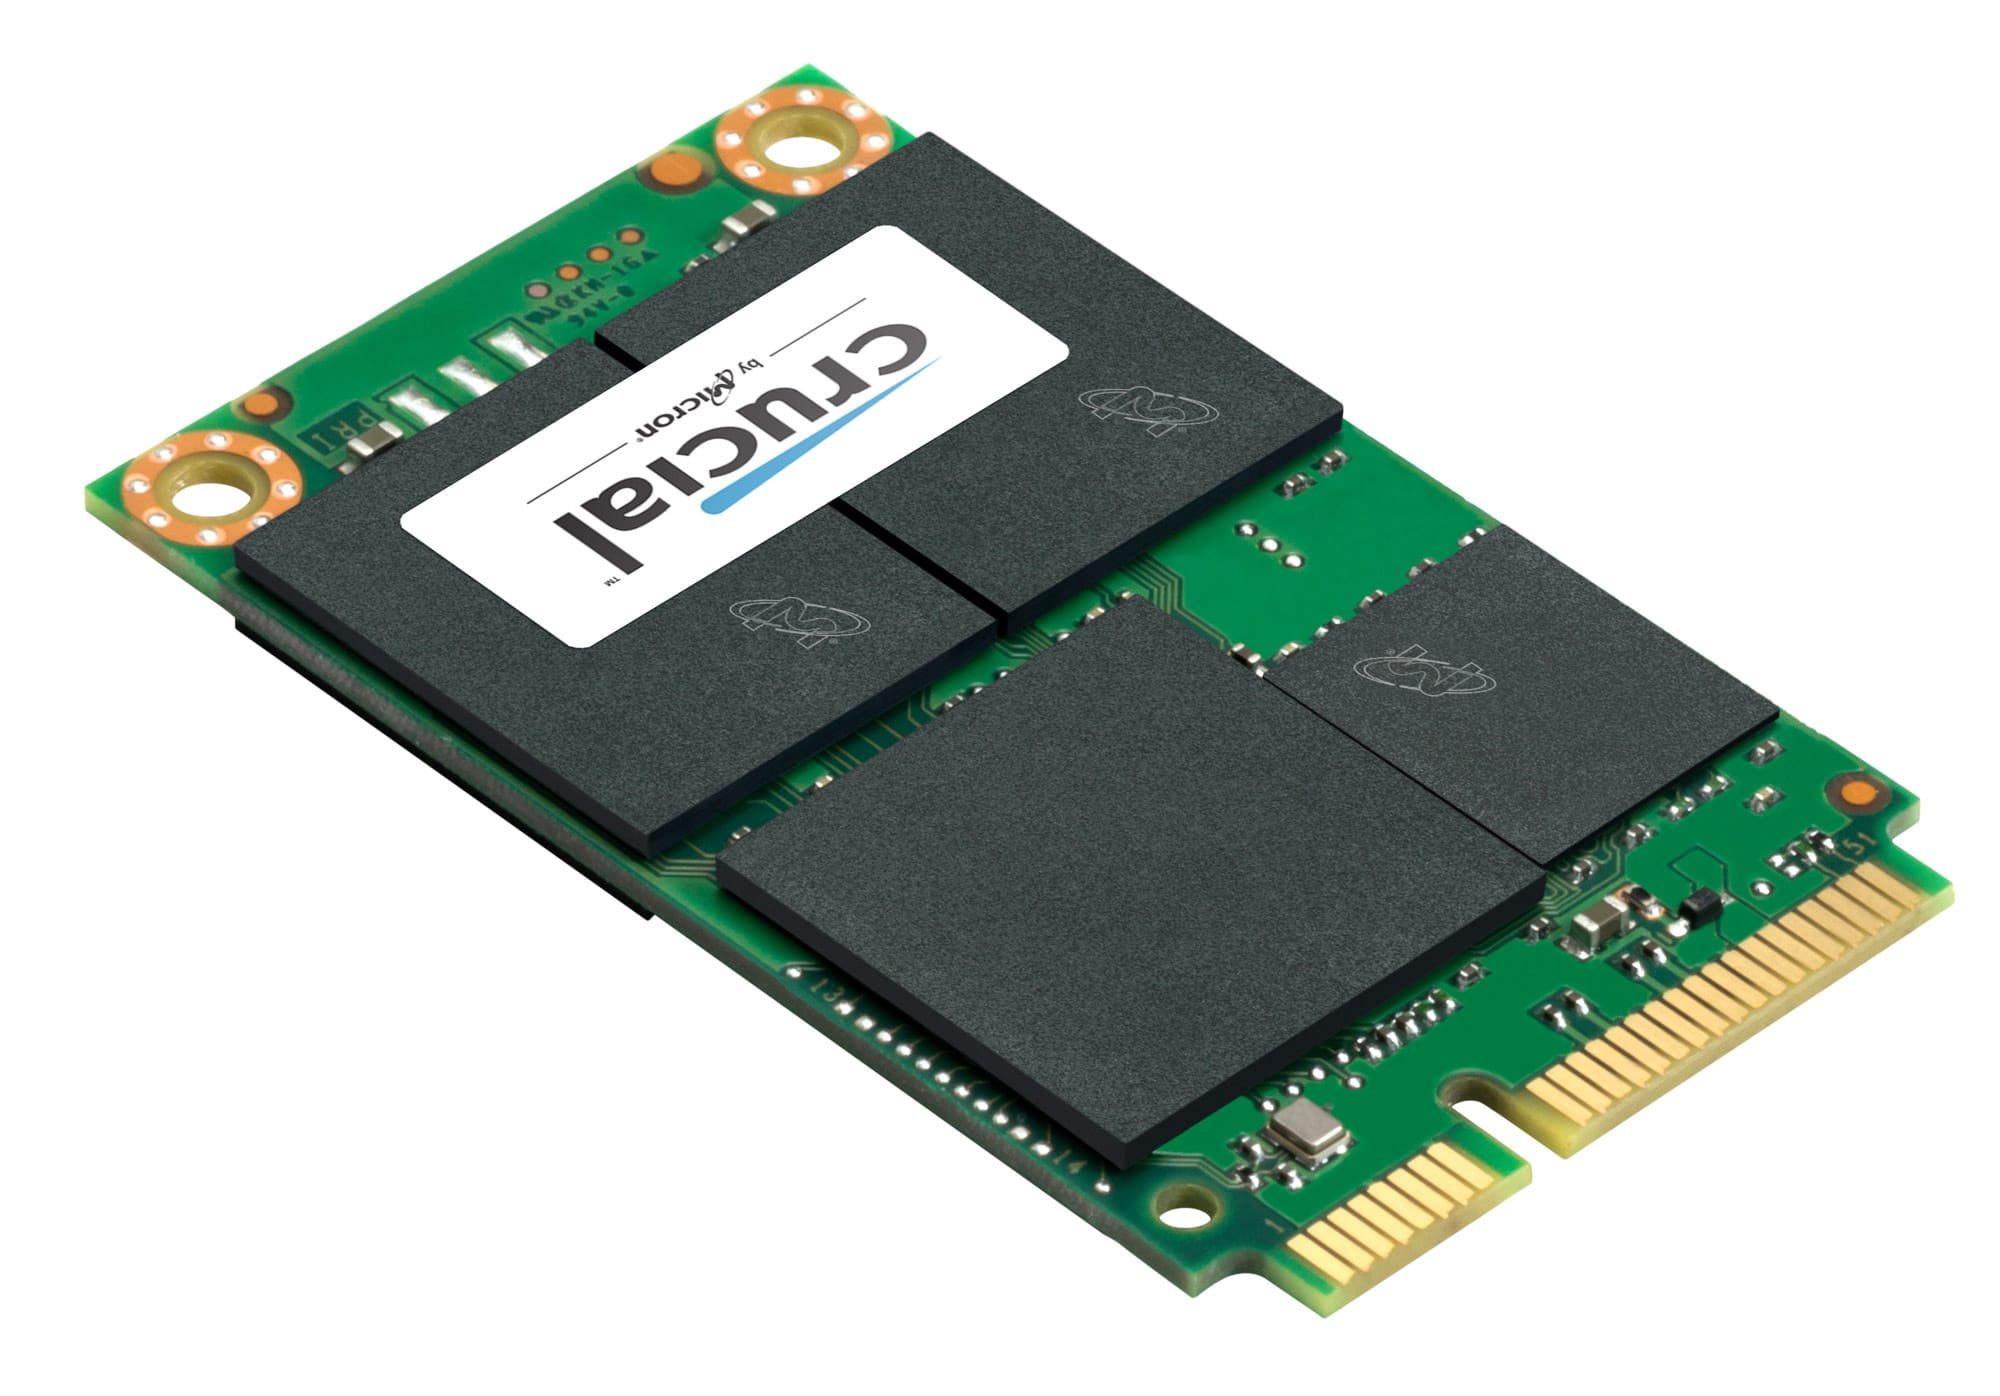 "<span class=""toptagtitre"">Bon Plan ! </span>SSD Crucial M550 mSATA de 512 Go en vente flash à 170€"